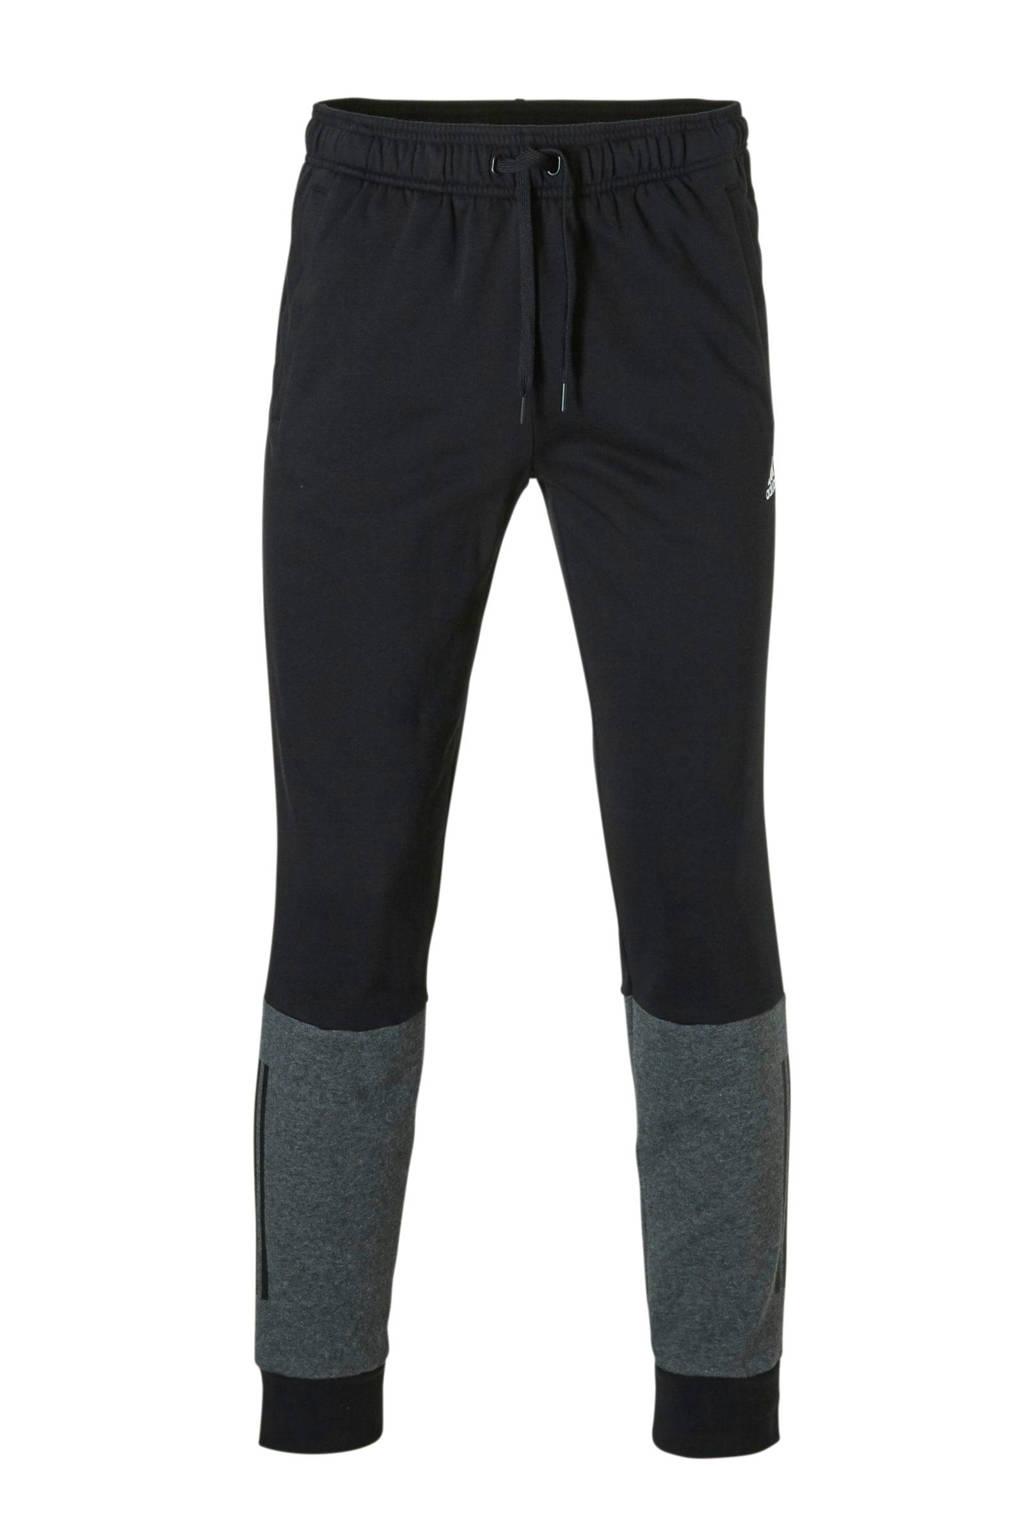 adidas performance joggingbroek zwart, Zwart/grijs